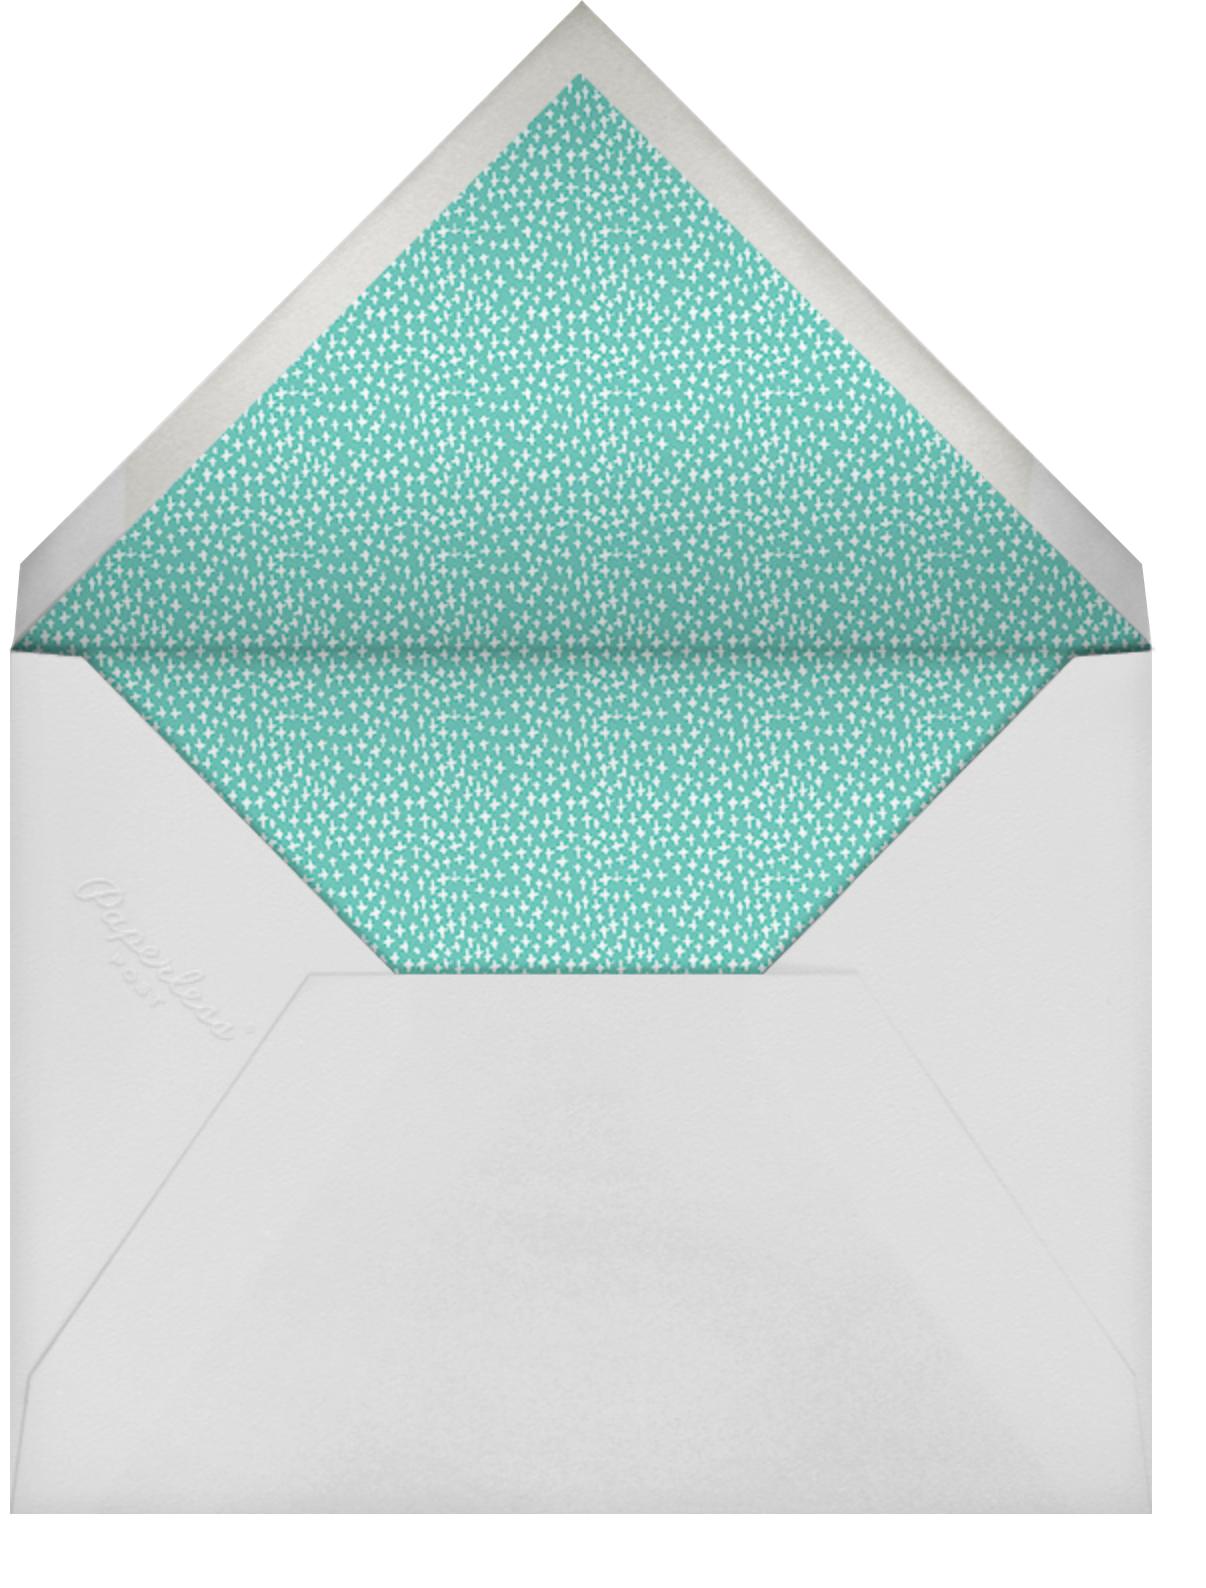 Just a Bite, I'm Stuffed - Mr. Boddington's Studio - Summer entertaining - envelope back